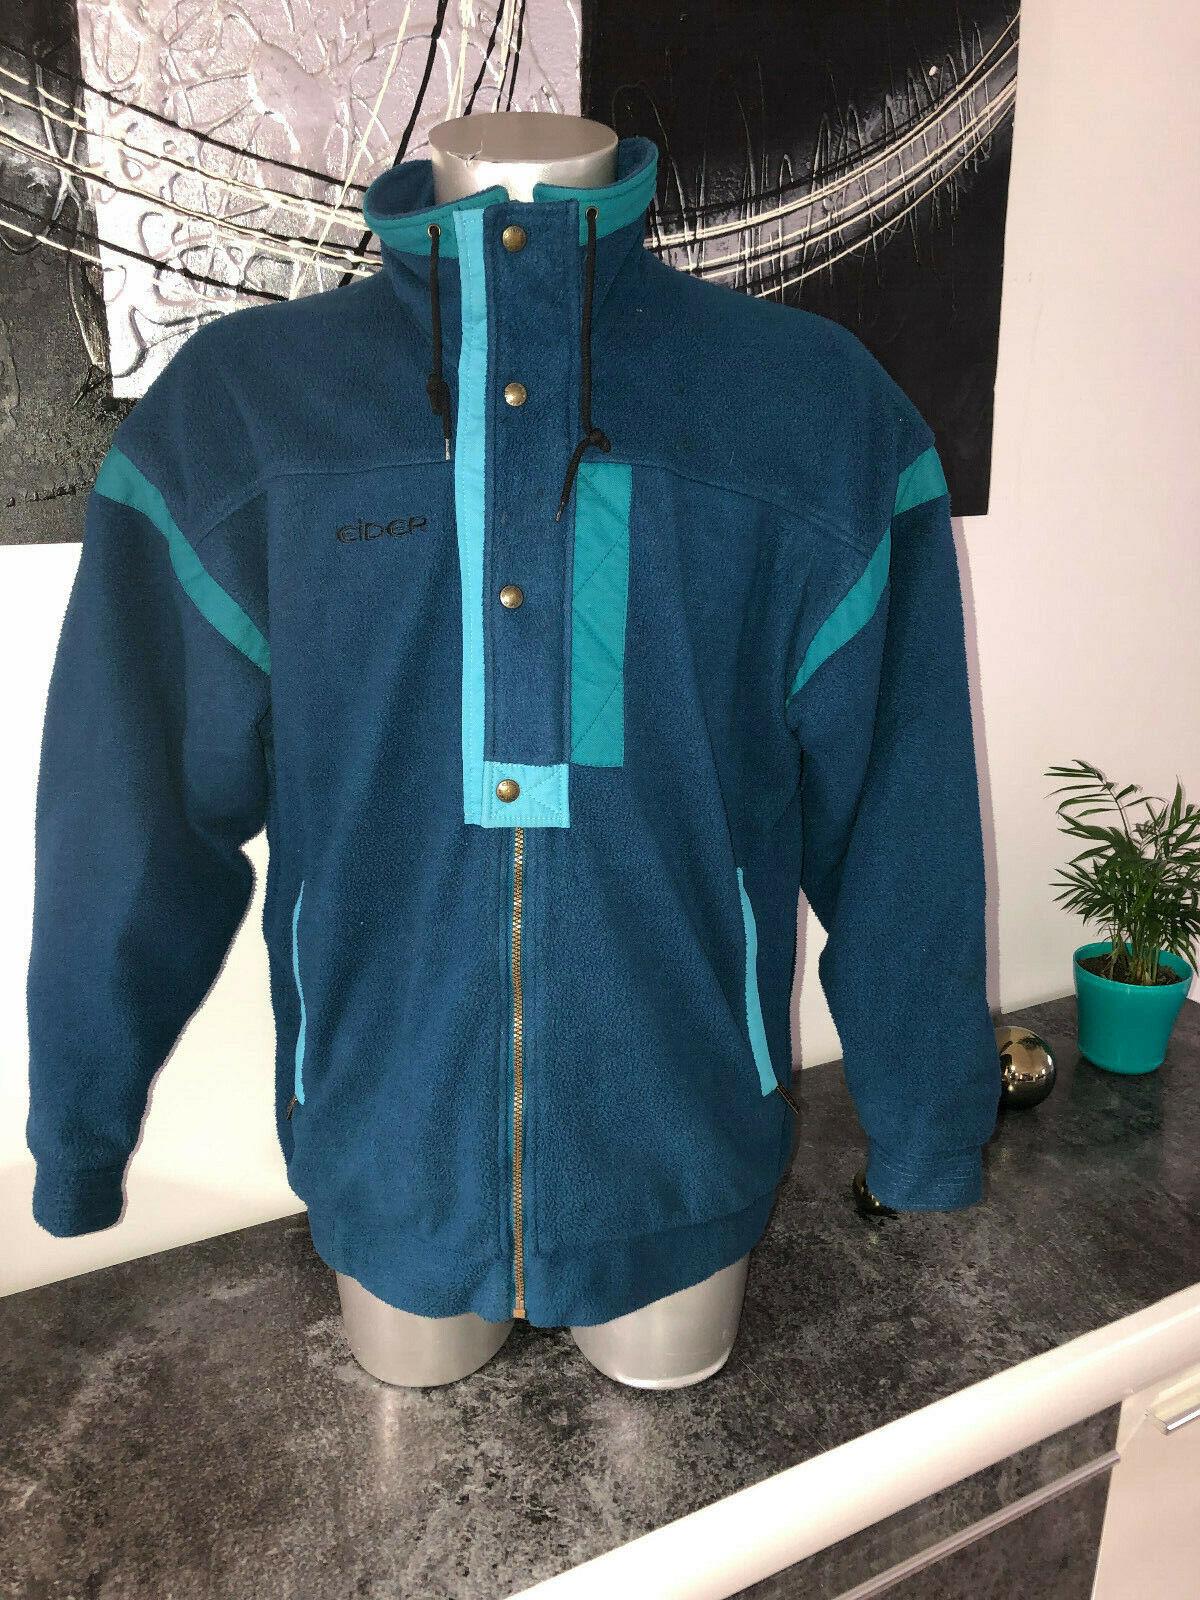 Vest Jacket Turquoise in Polar Fleece Polartec Man Eider Hokkaido Größe 52(XL)